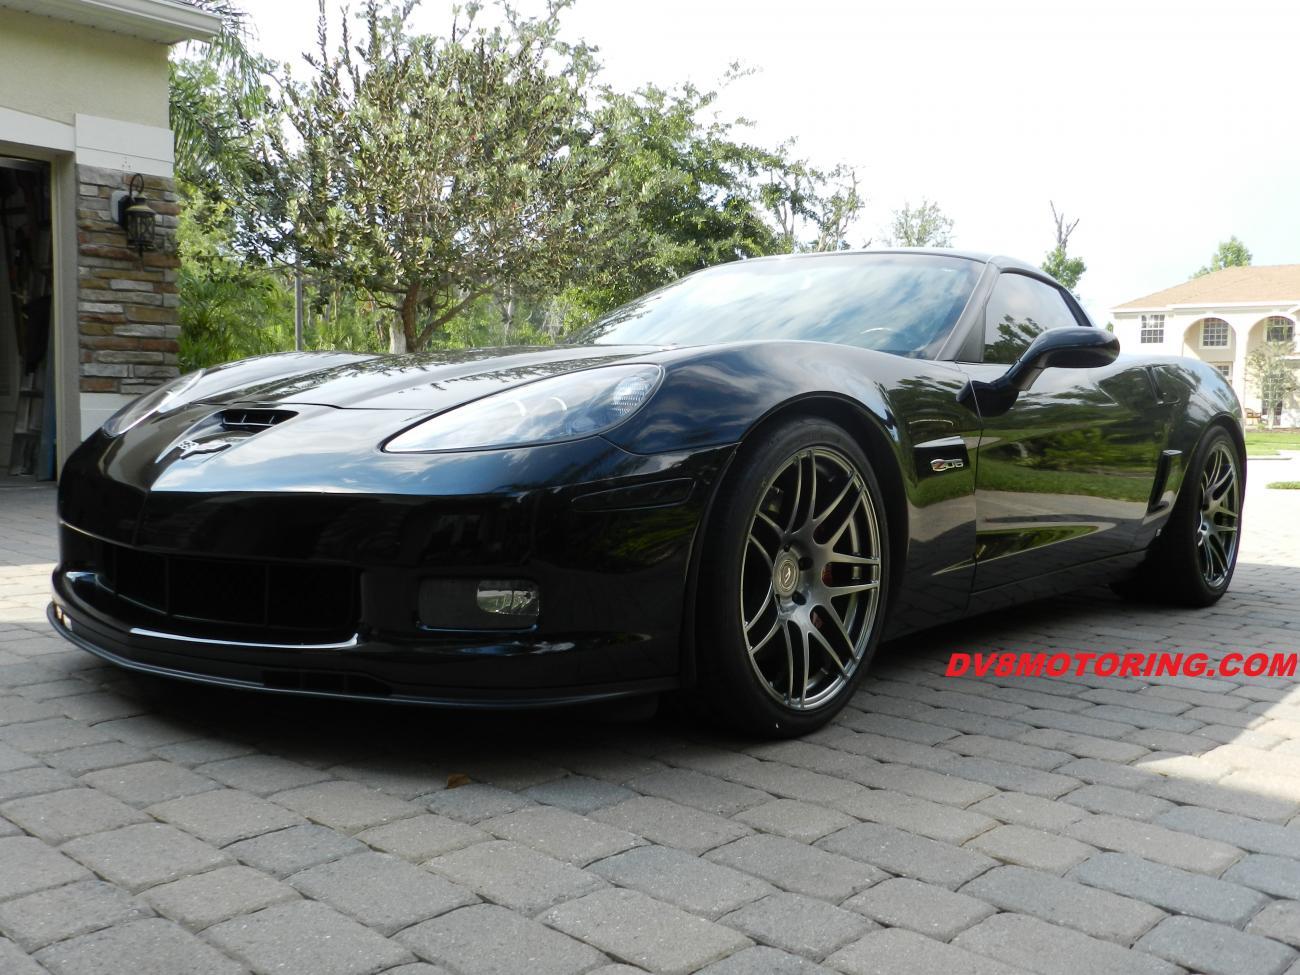 New Forgestar F14 On Z06 Corvetteforum Chevrolet